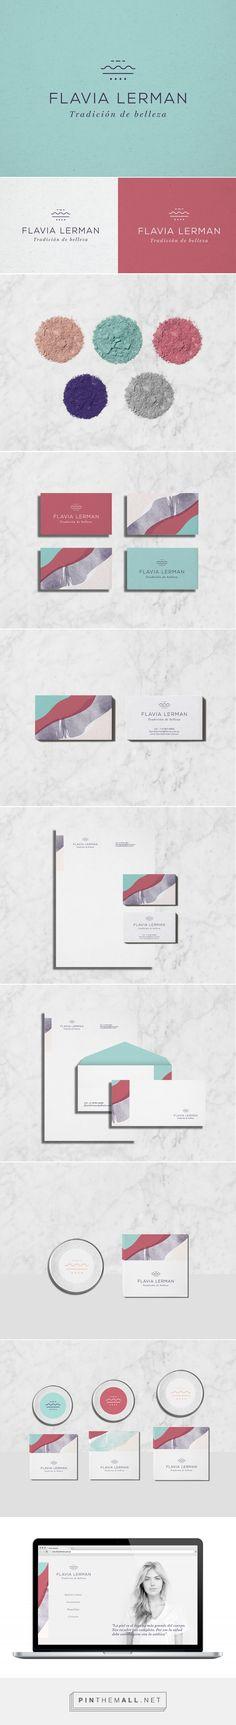 Flavia Lerman Beauty Branding by Cobra Studio | Fivestar Branding Agency – Design and Branding Agency & Curated Inspiration Gallery